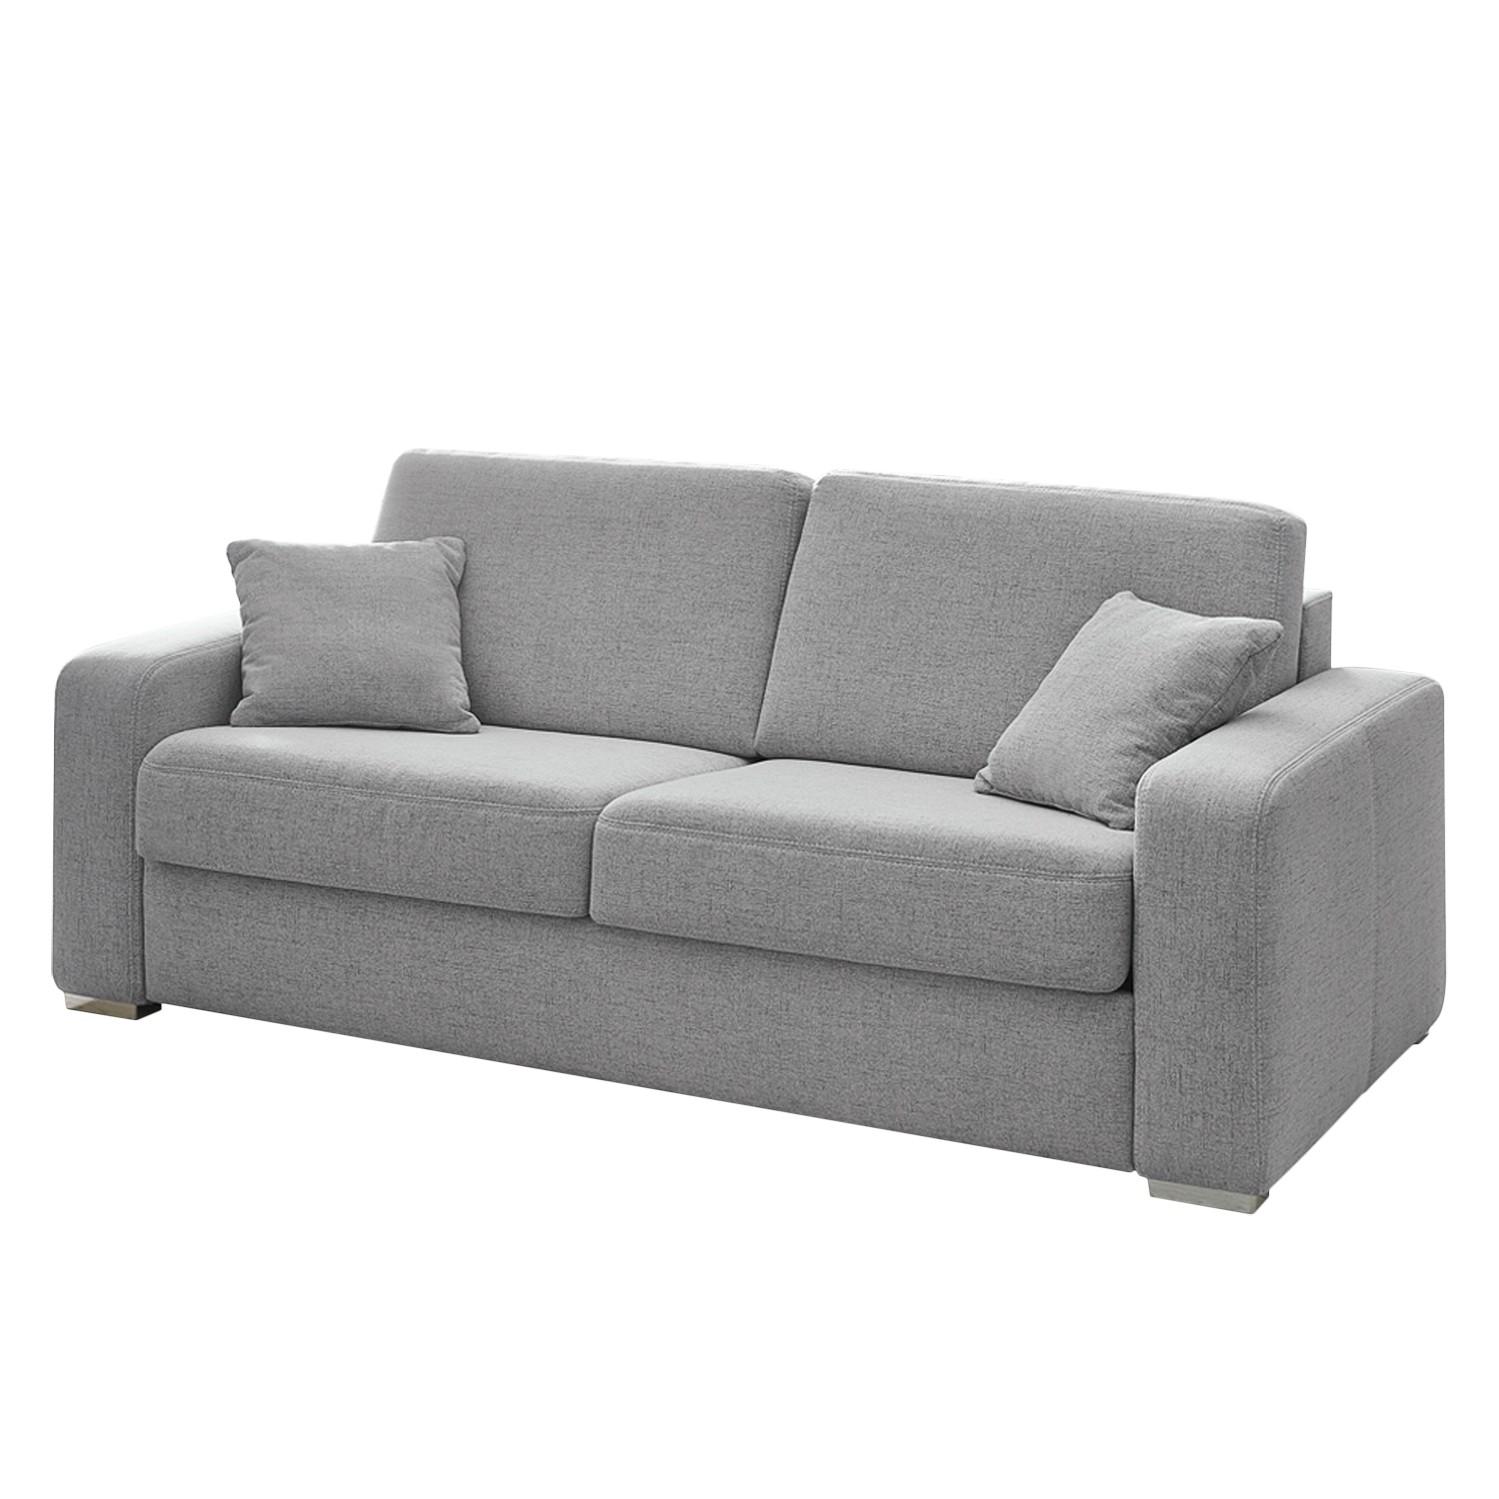 Schlafsofa Coro - Webstoff - Grau, Home Design